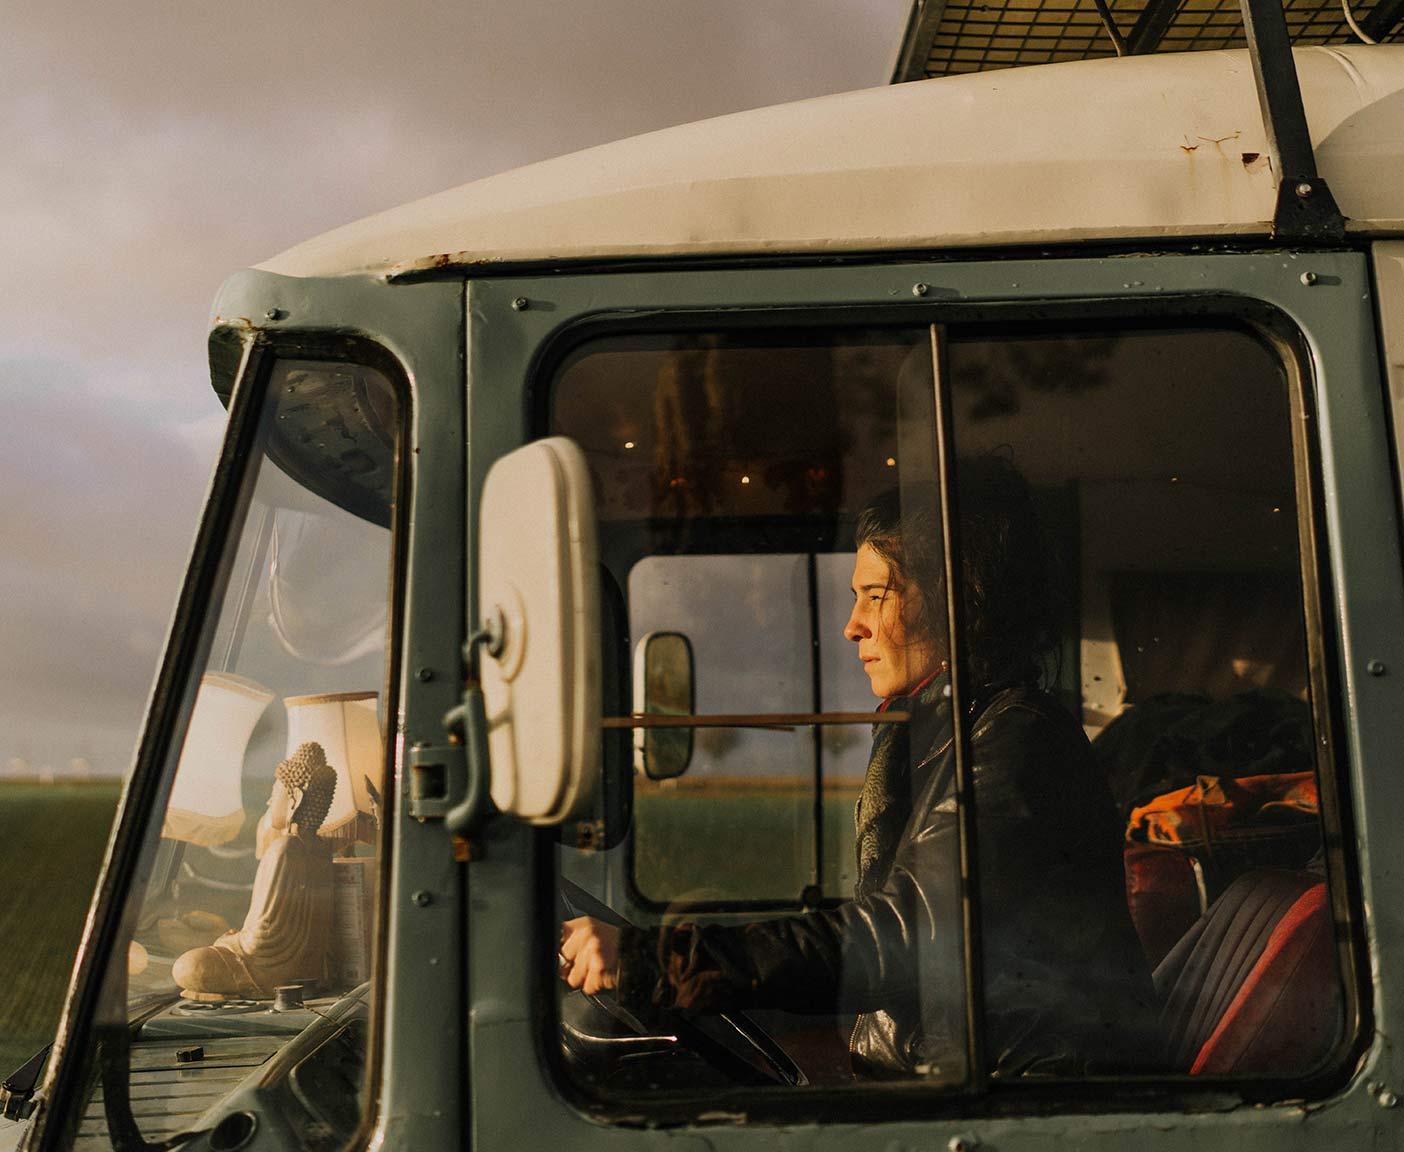 Mercedes-benz-508-d-verbrauch-innenausbau-wohnmobil-camper-woman-driver